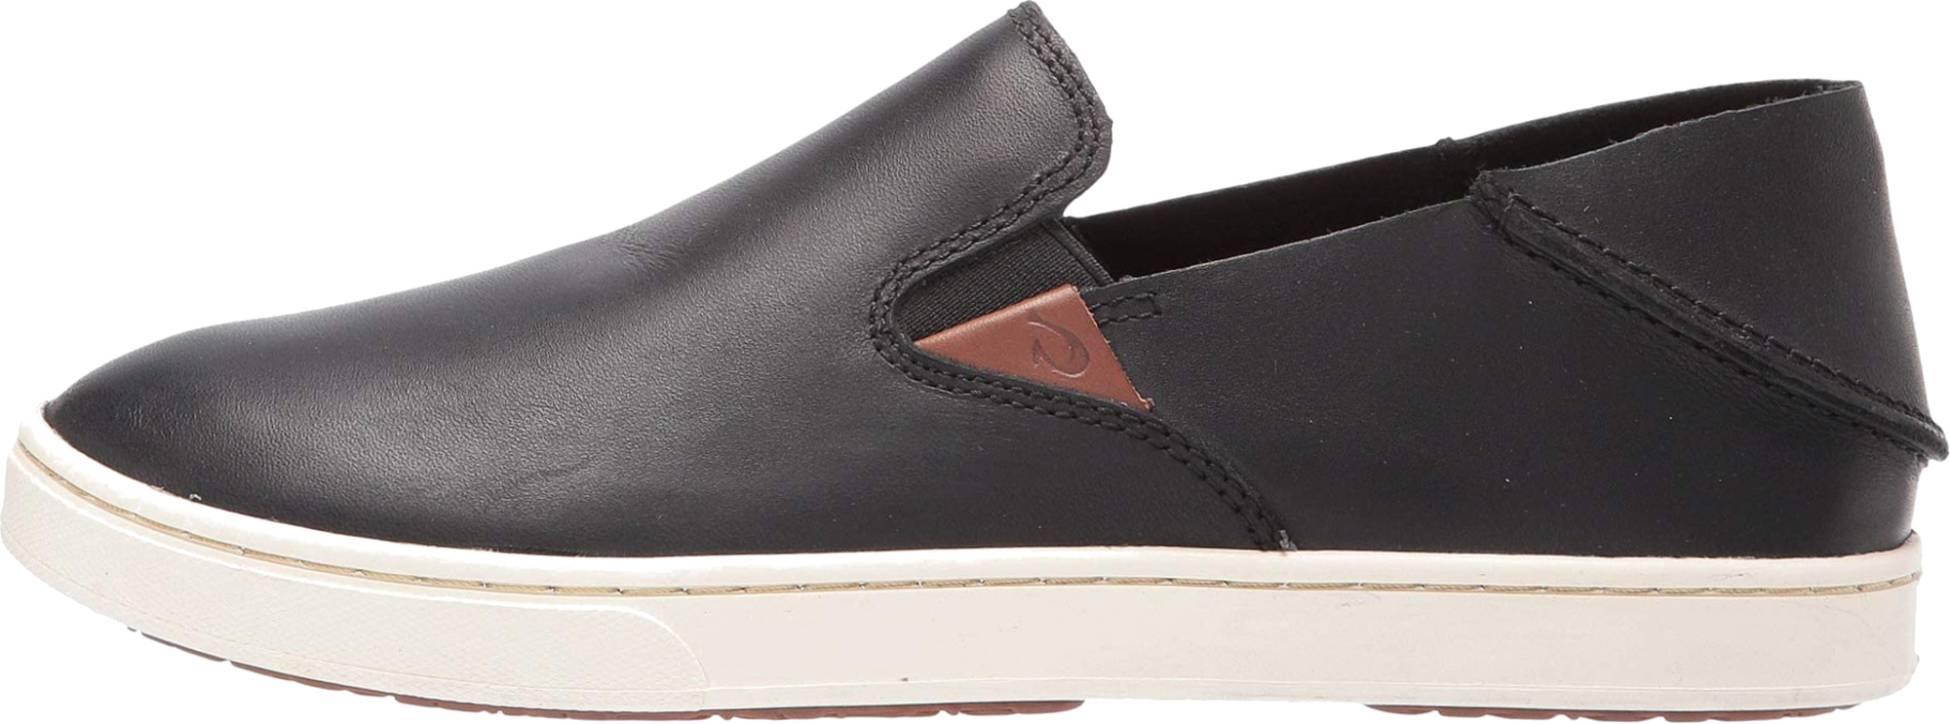 Review of OluKai Pehuea Leather